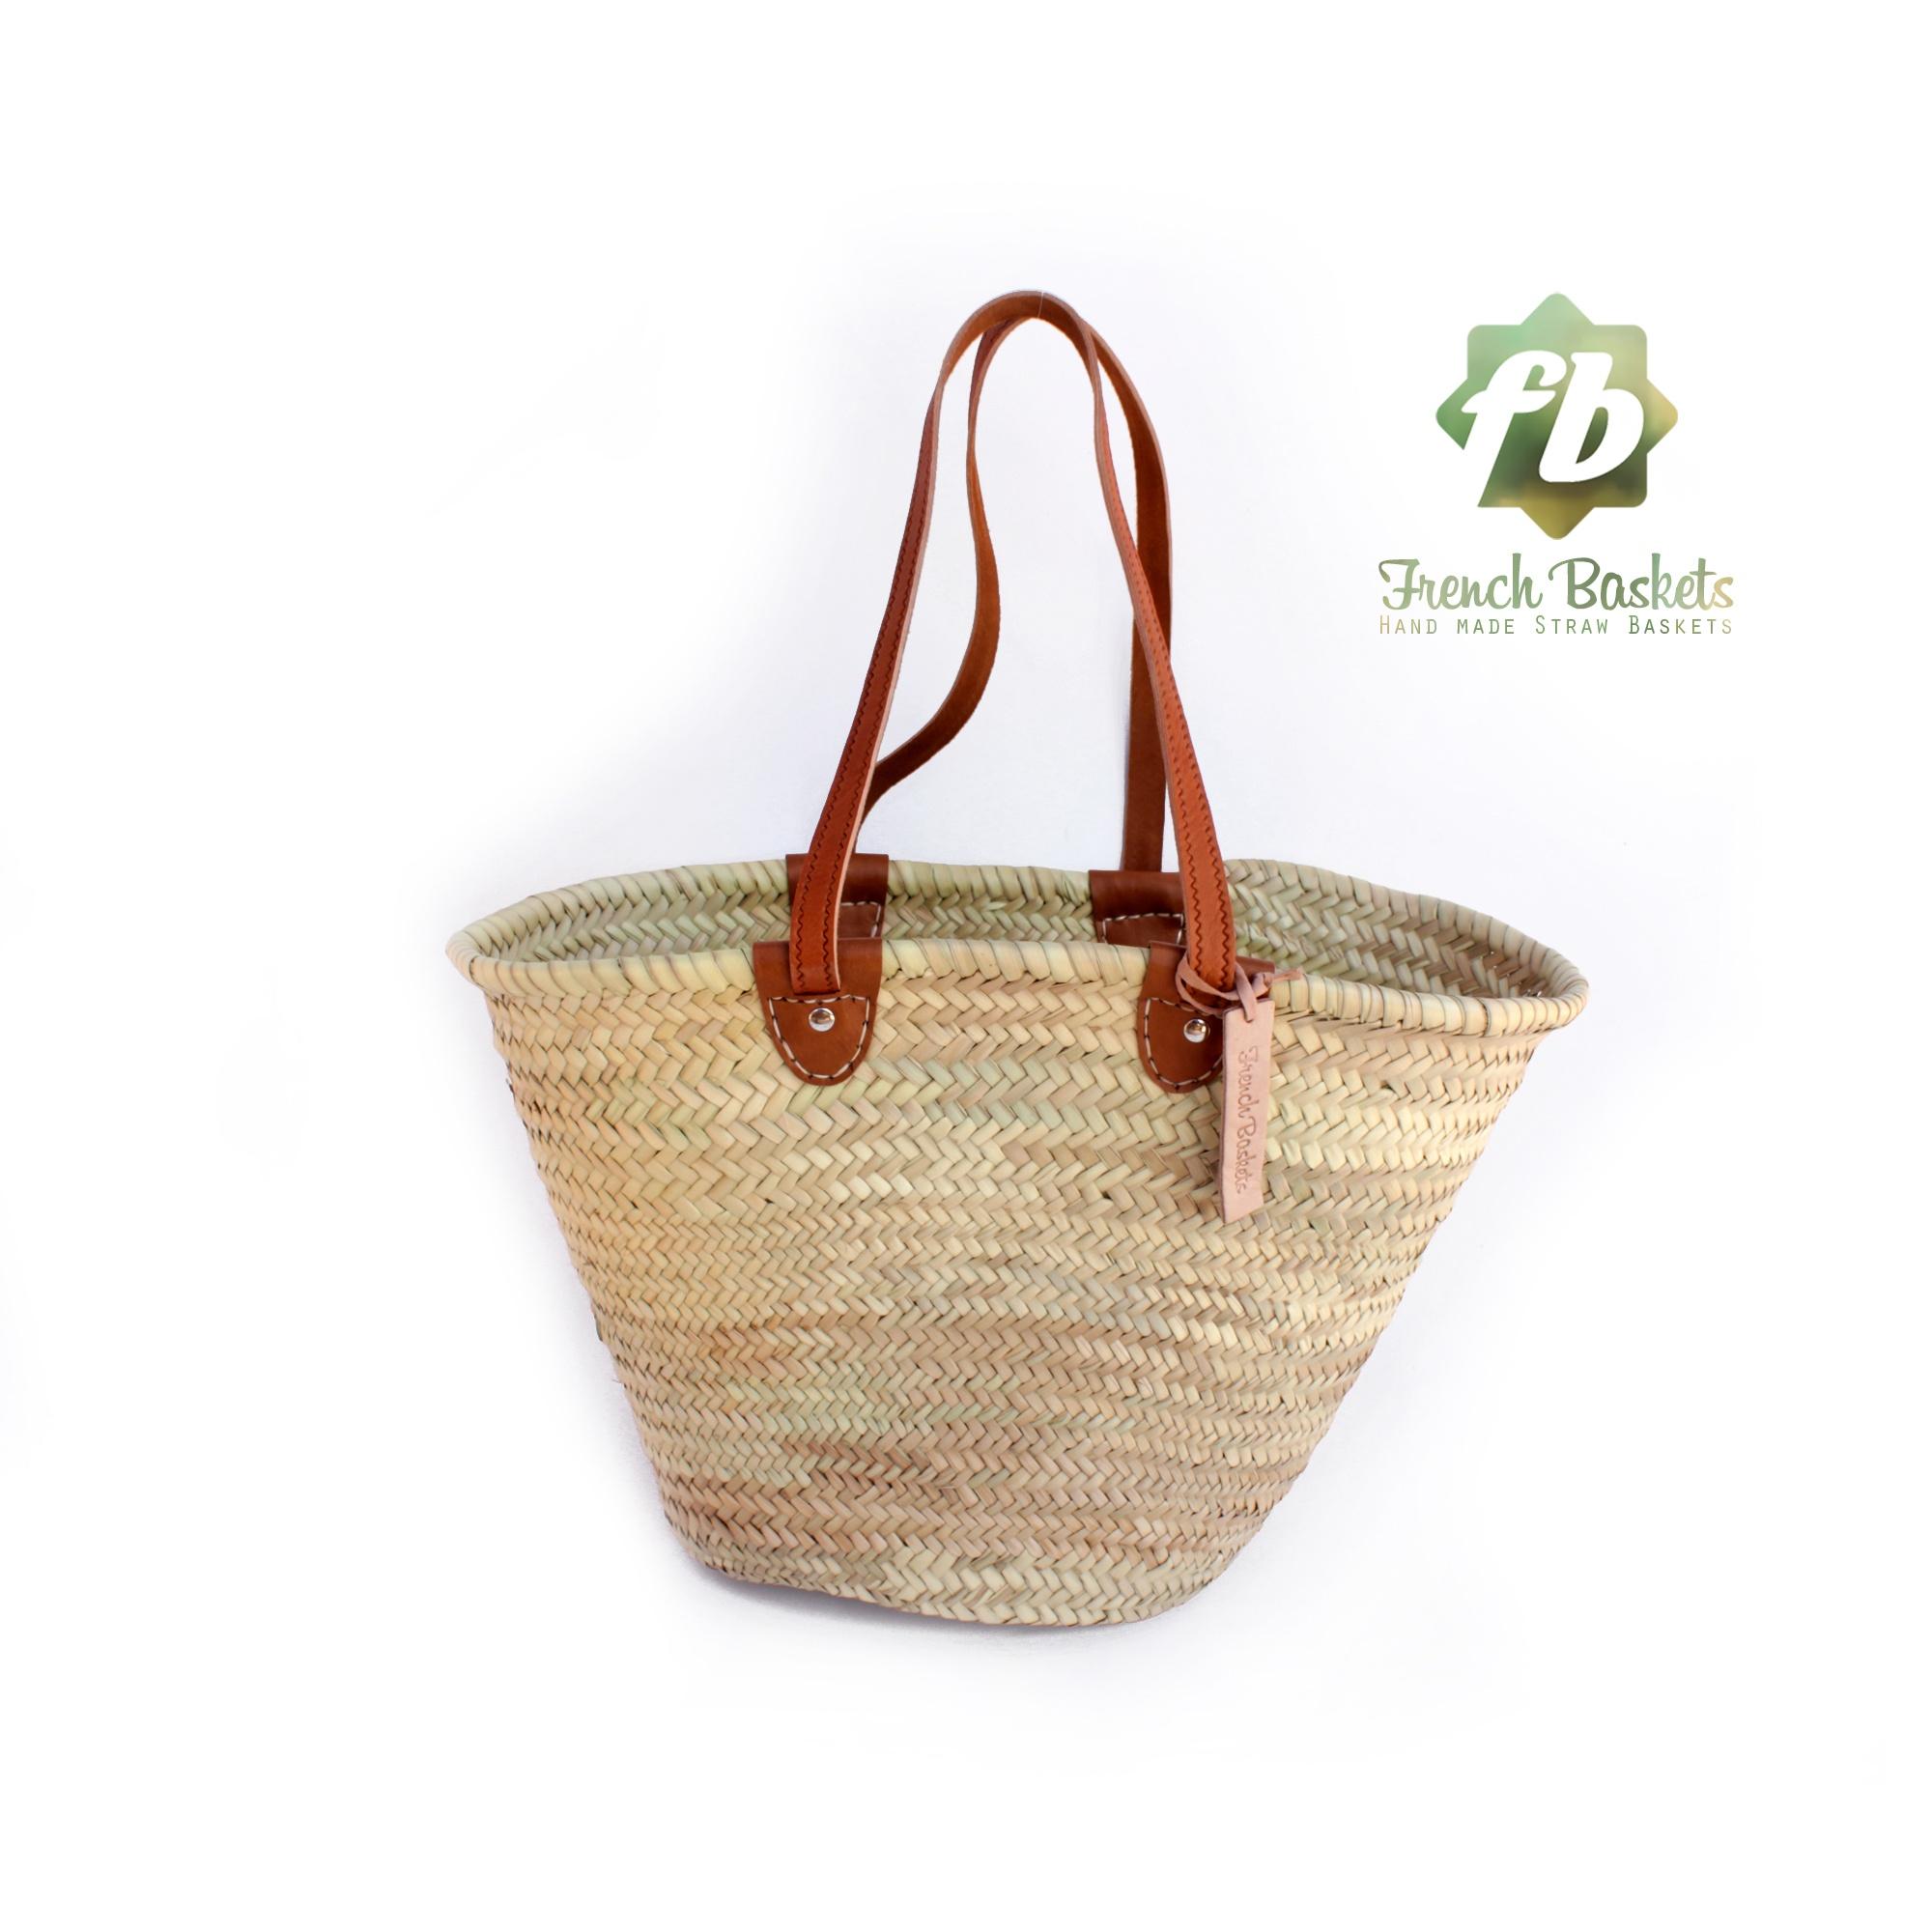 luxury straw bag Handmade French Basket - luxury Basket long Flat Leather Handle